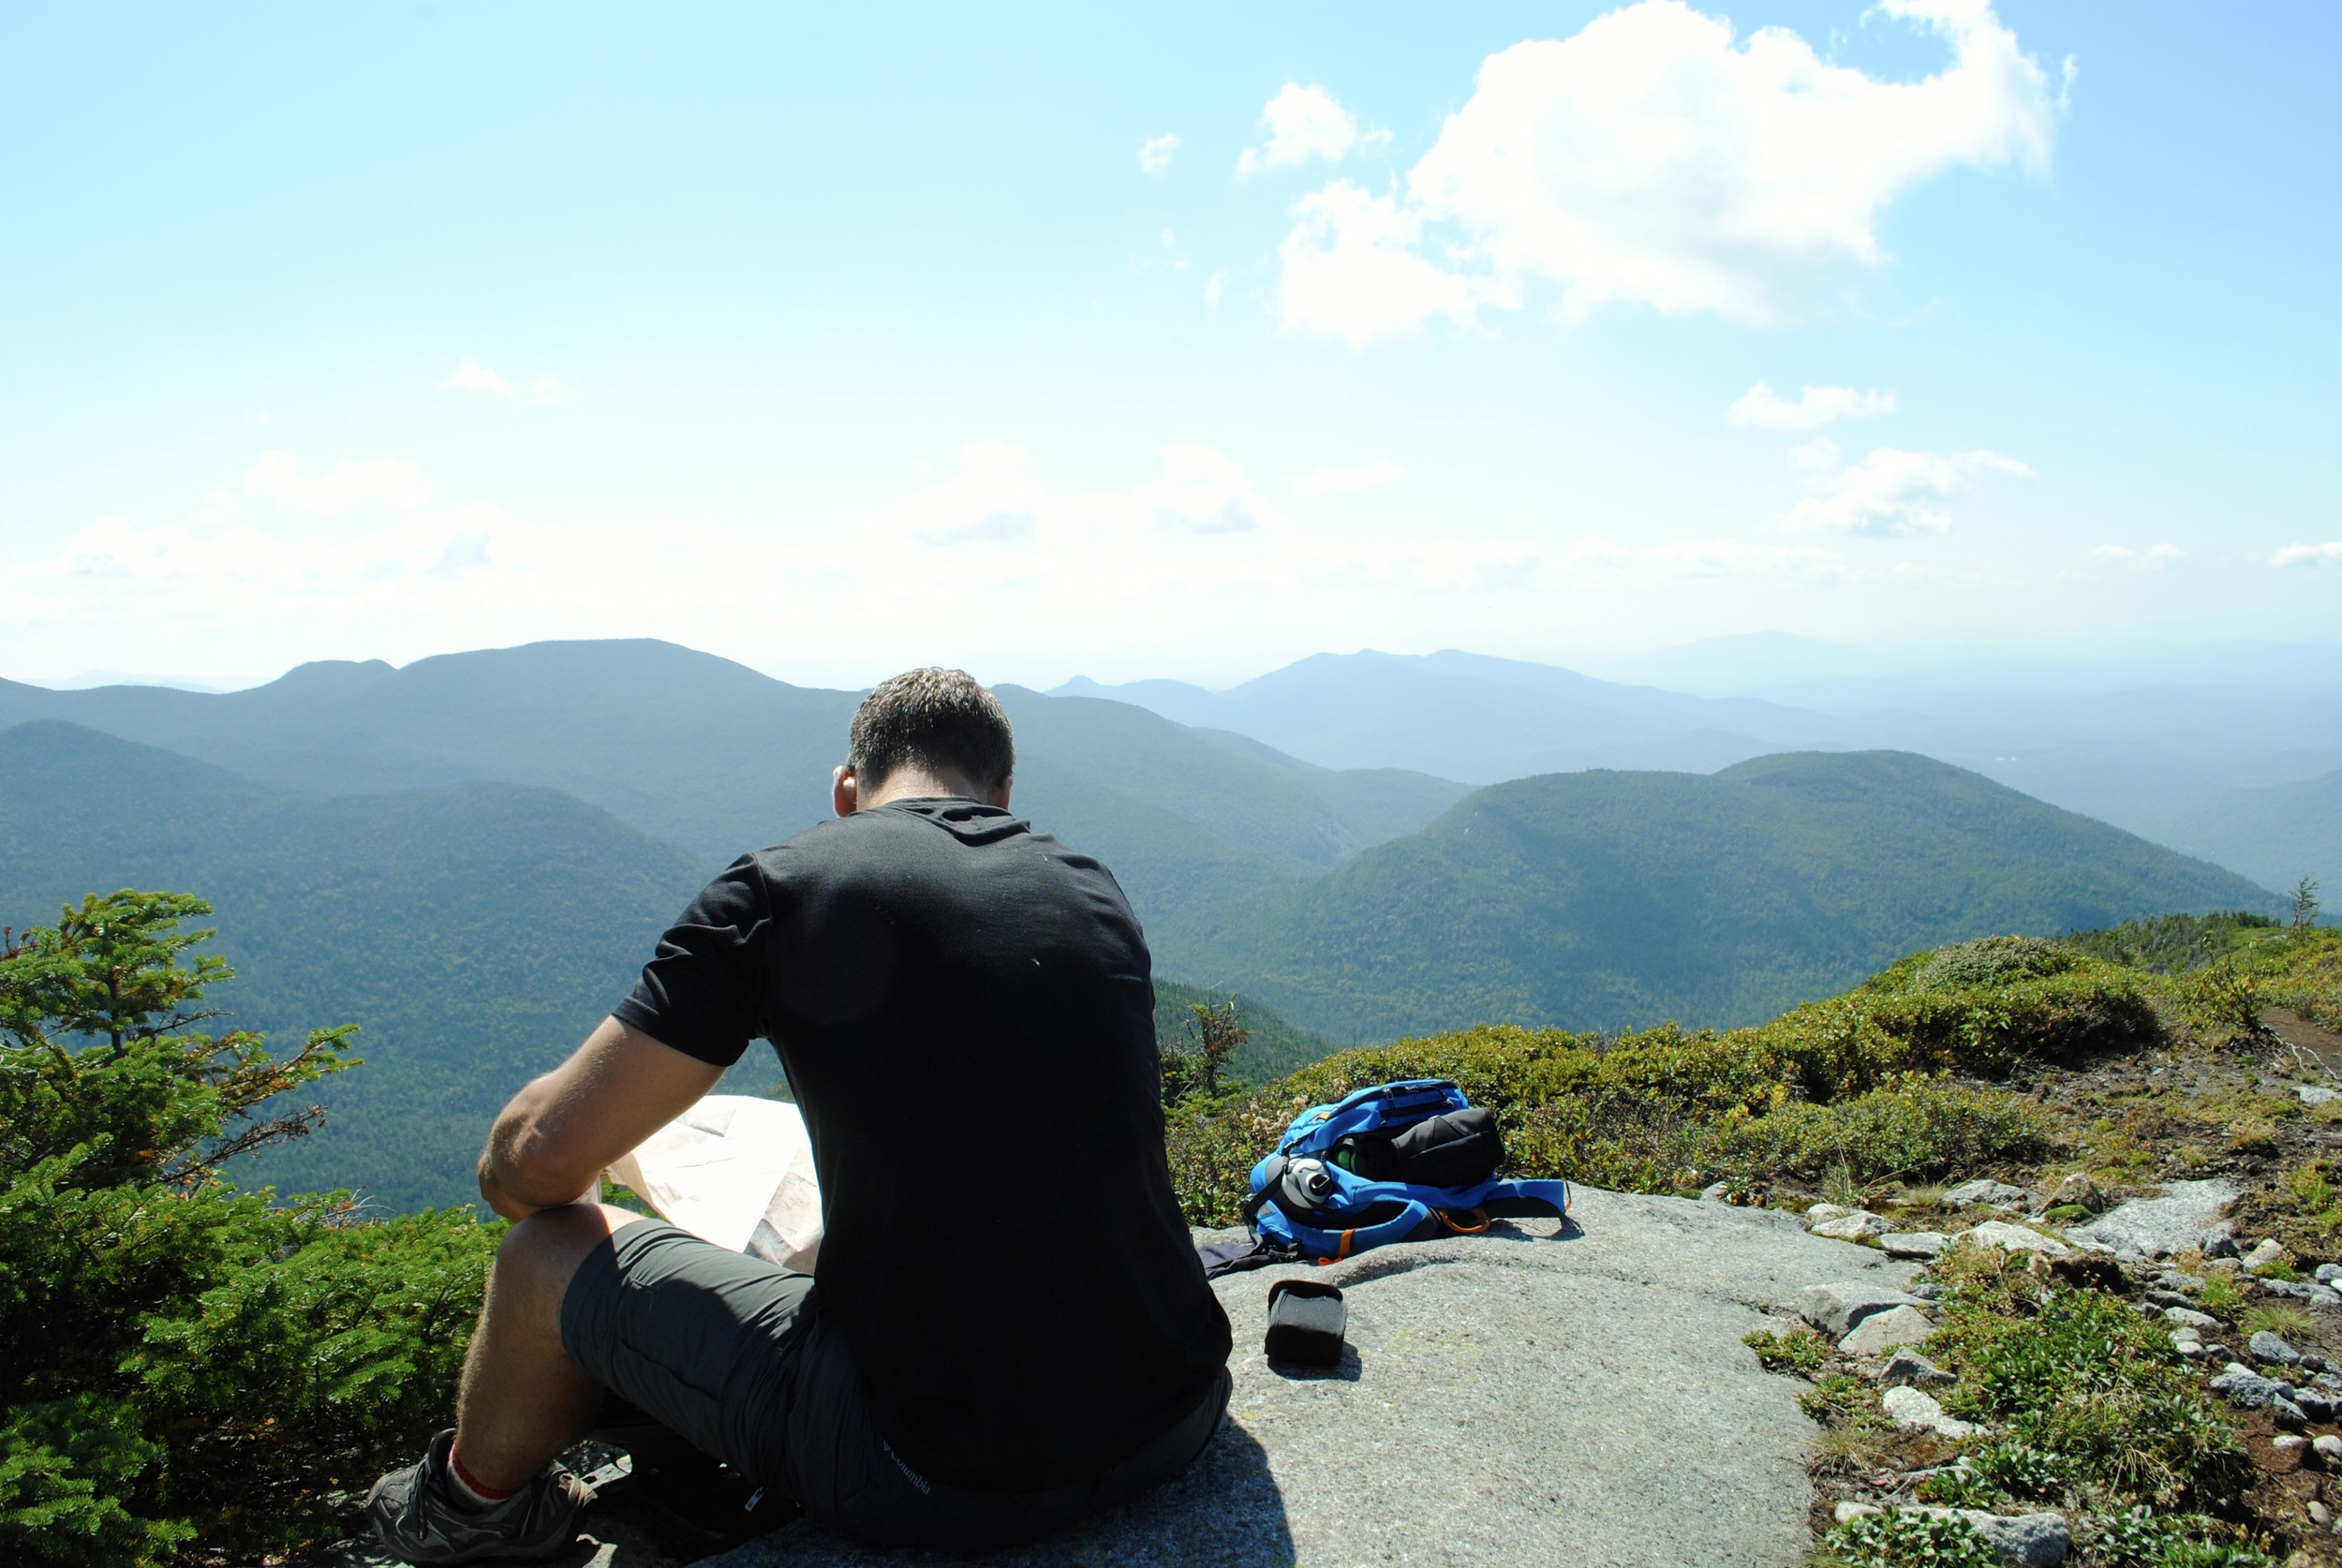 Mountain breaks are always well needed - Mount Colden